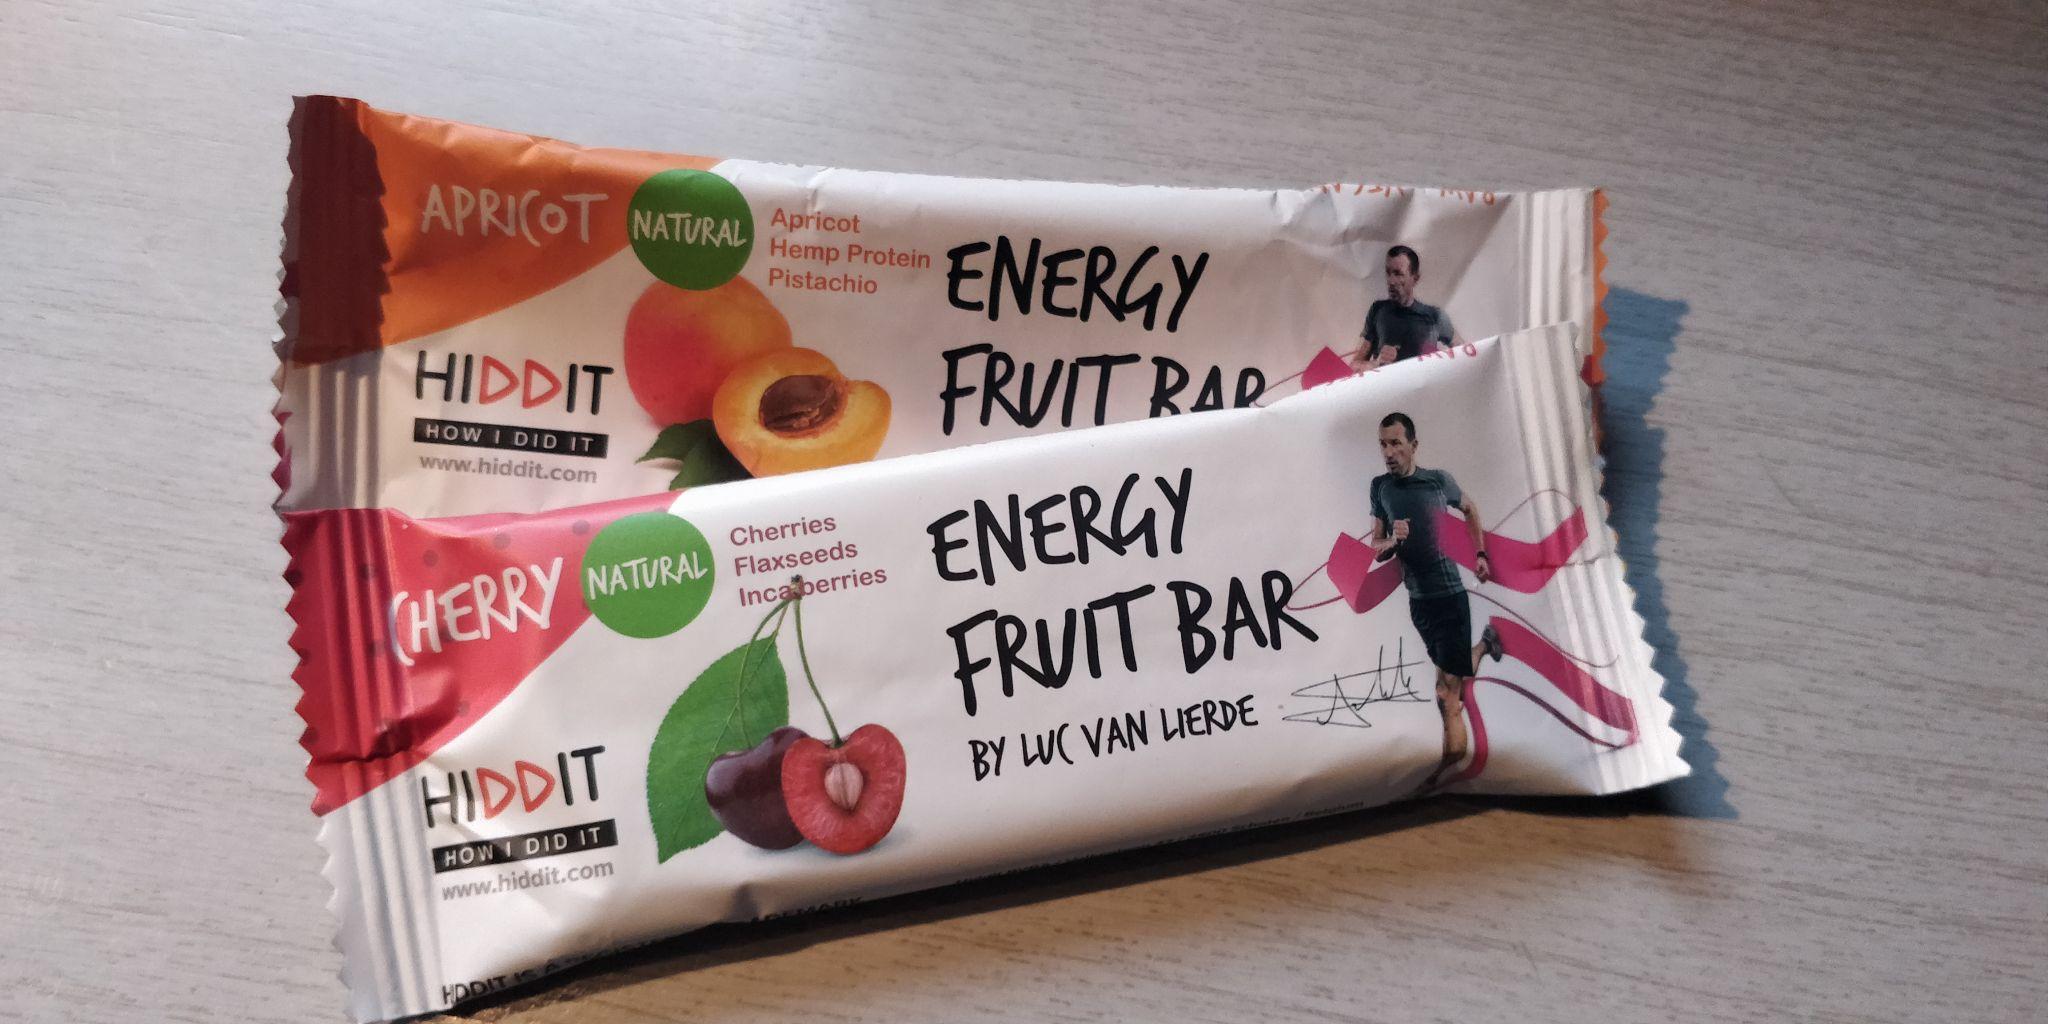 Hiddit Fruit Bars